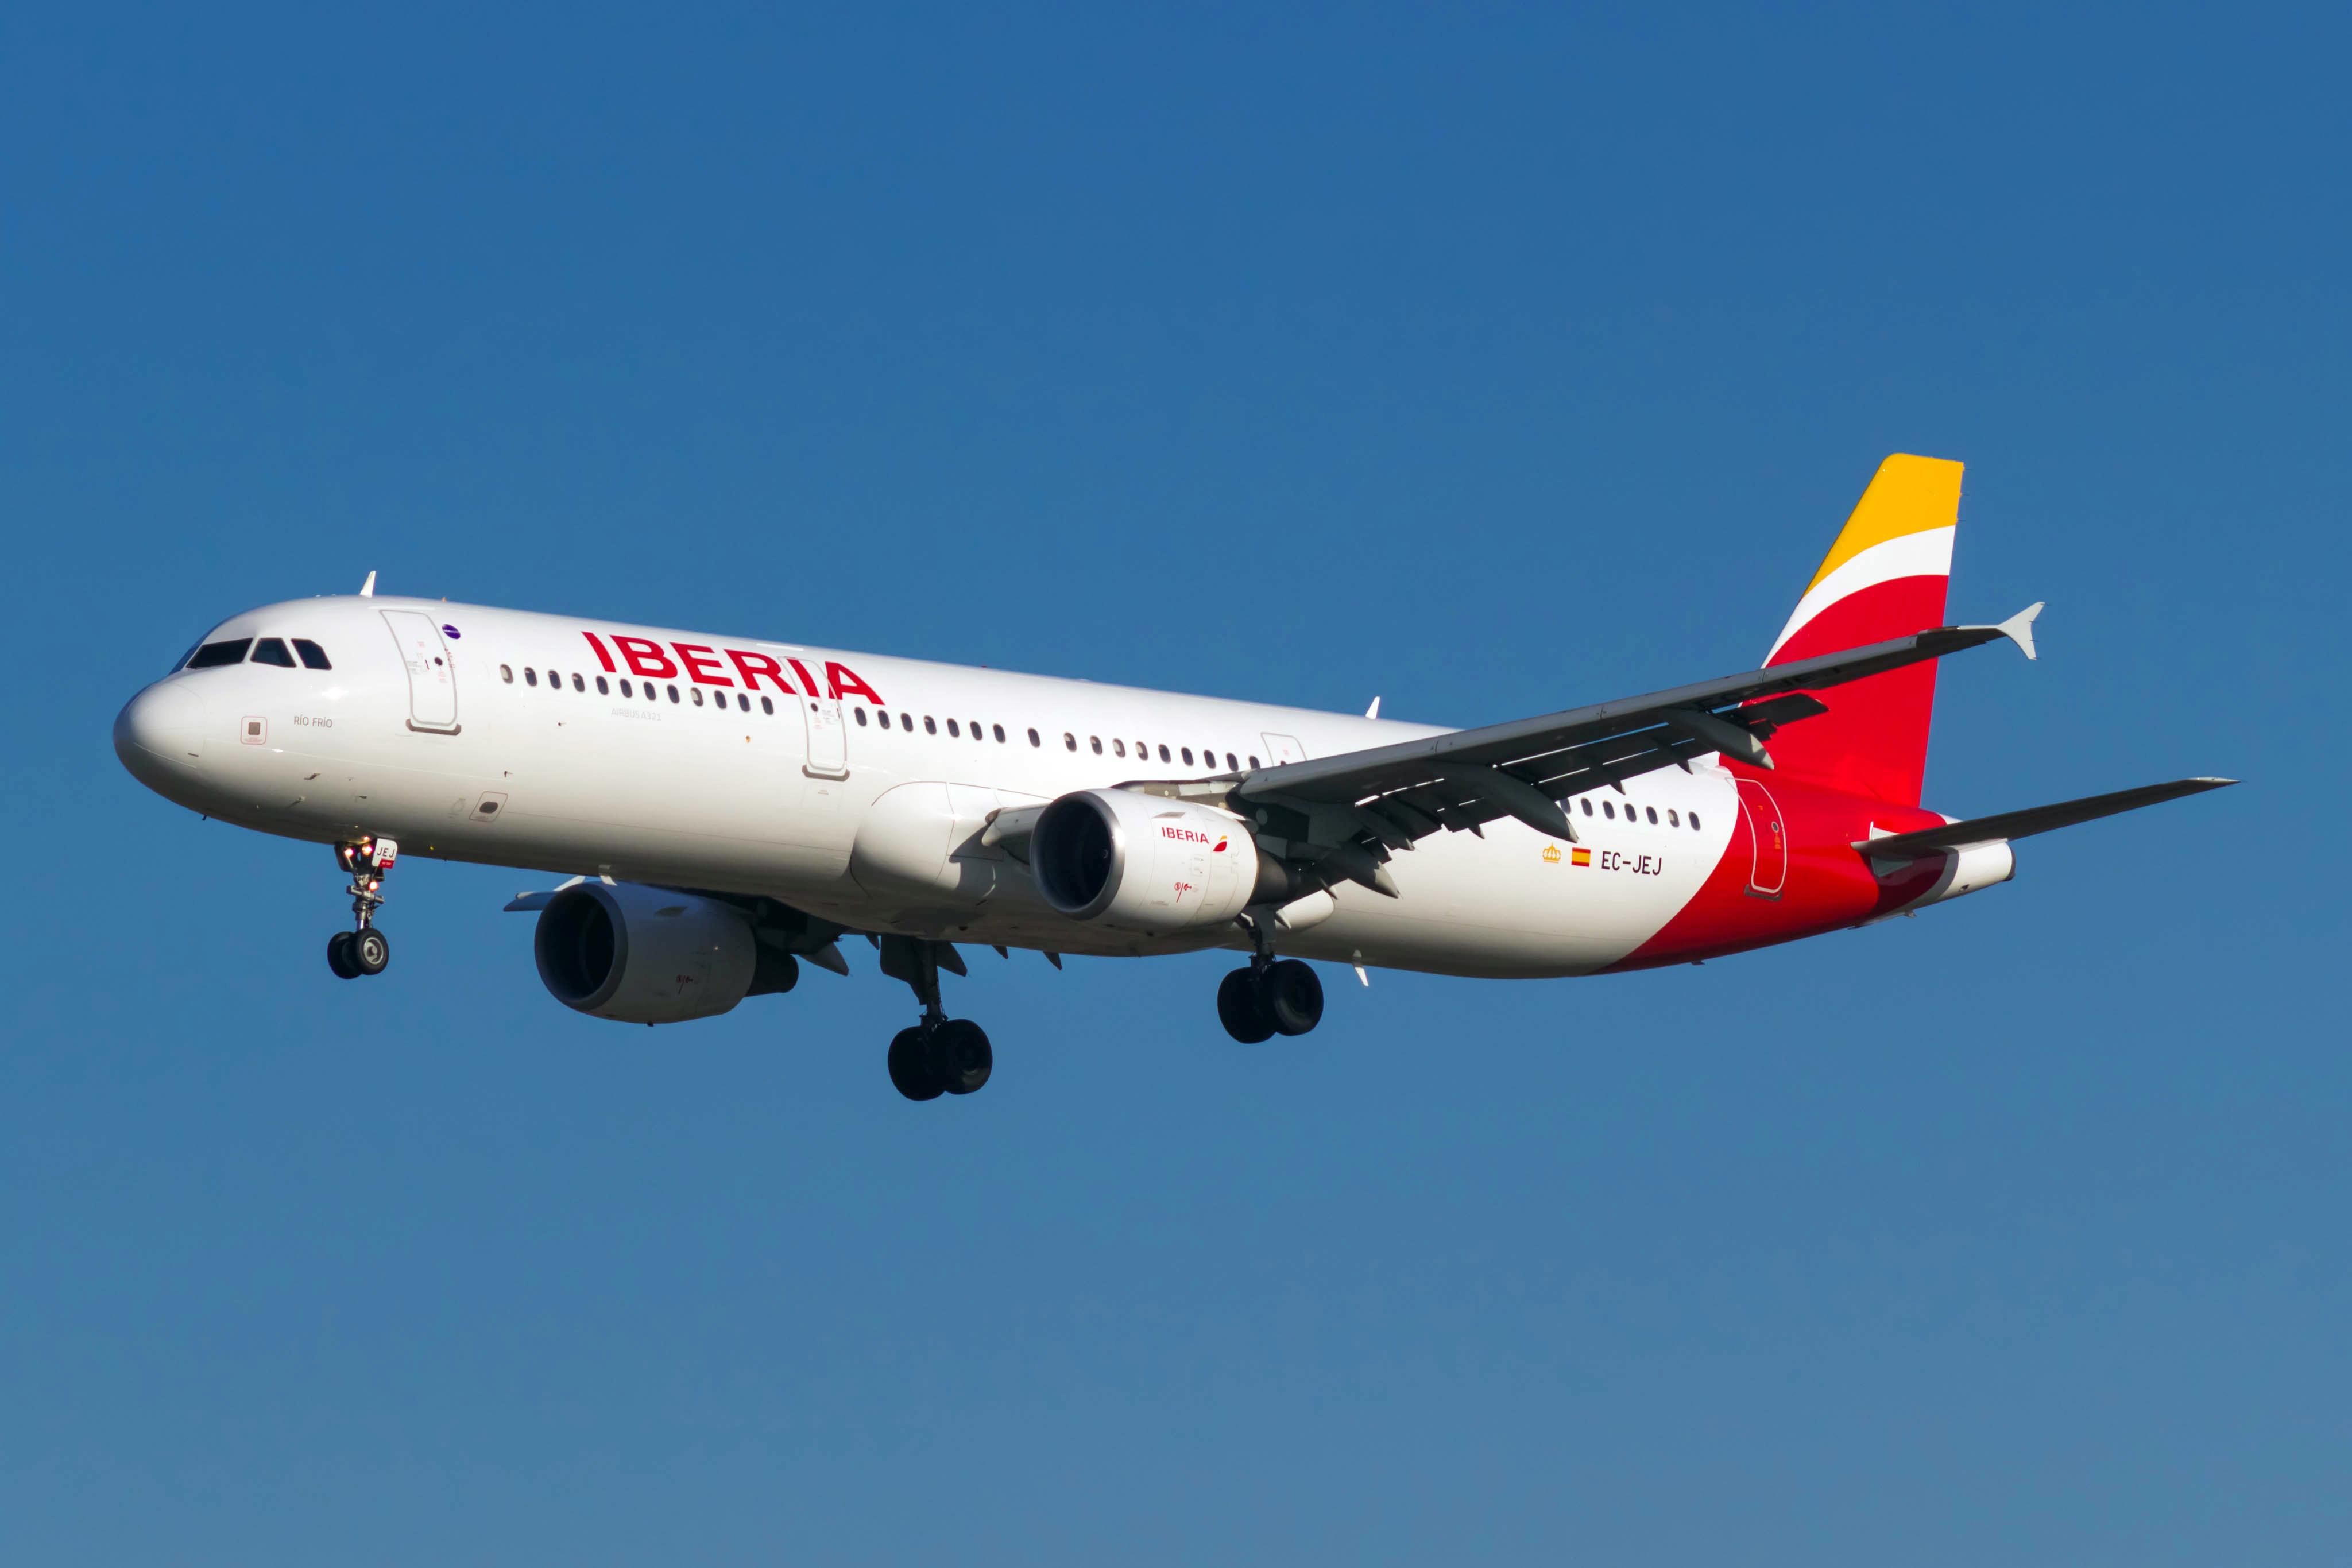 En Airbus A321 fra Iberia. Foto: Bene Riobó